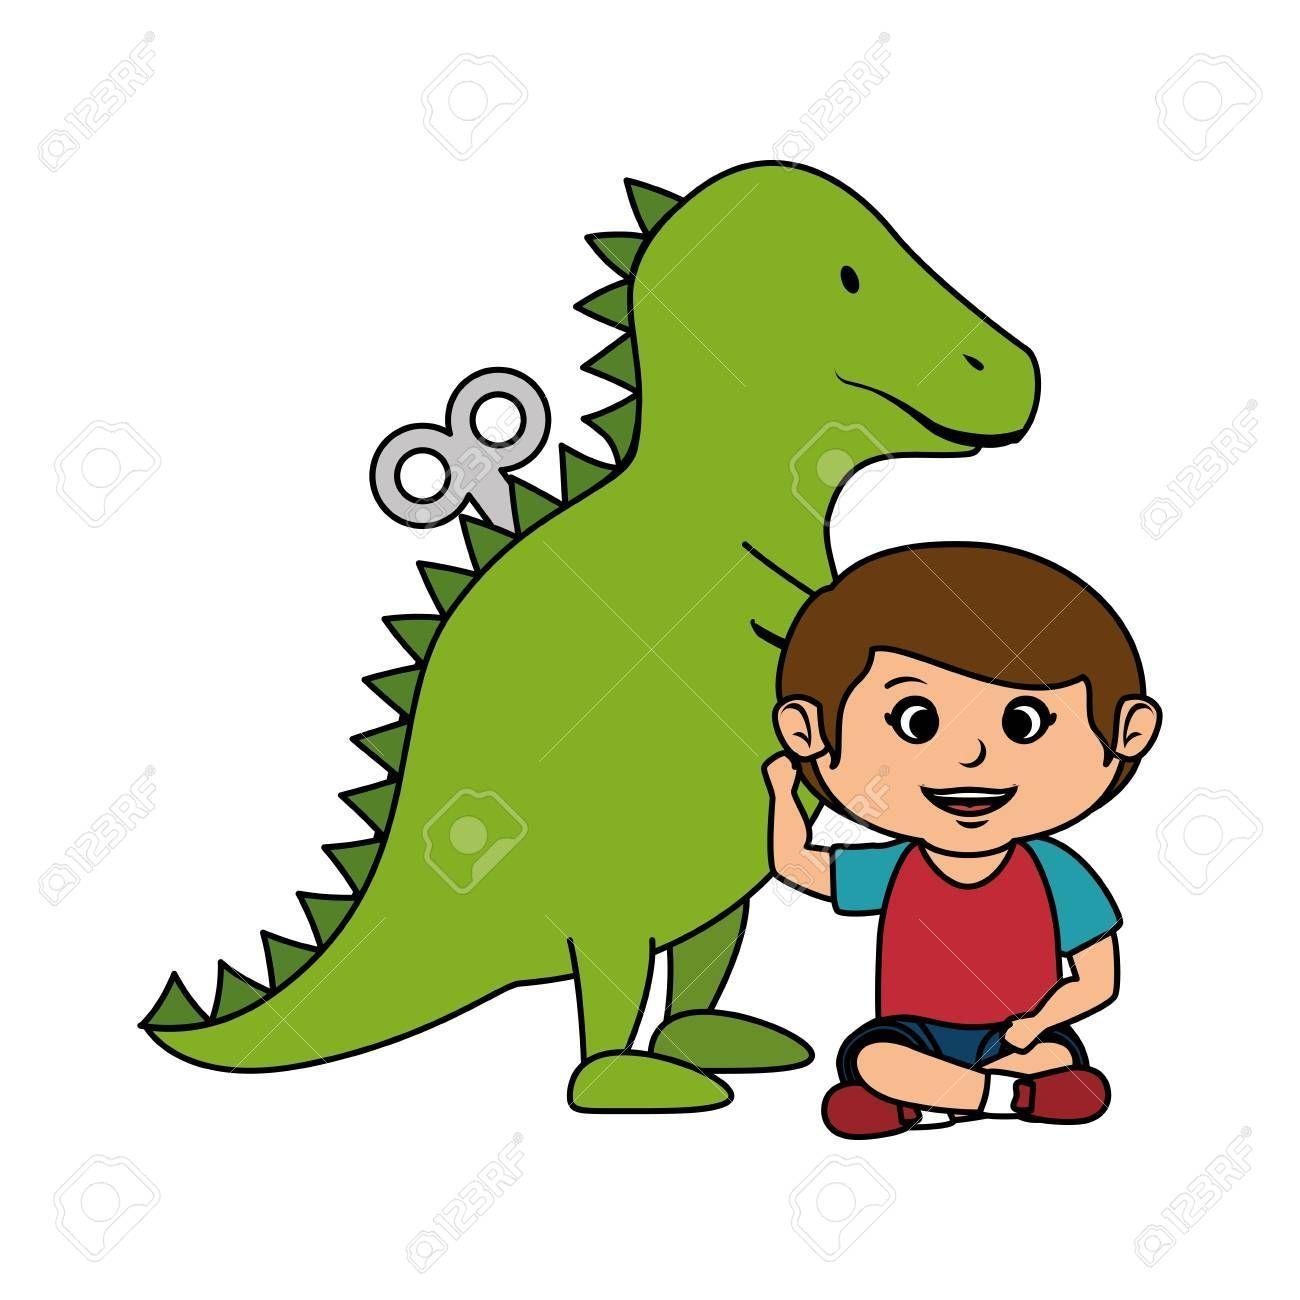 little boy with tyrannosaurus rex toy vector illustration design Illustration , #affiliate, #rex, #toy, #boy, #tyrannosaurus, #design #tyrannosaurusrex little boy with tyrannosaurus rex toy vector illustration design Illustration , #affiliate, #rex, #toy, #boy, #tyrannosaurus, #design #tyrannosaurusrex little boy with tyrannosaurus rex toy vector illustration design Illustration , #affiliate, #rex, #toy, #boy, #tyrannosaurus, #design #tyrannosaurusrex little boy with tyrannosaurus rex toy vector #tyrannosaurusrex